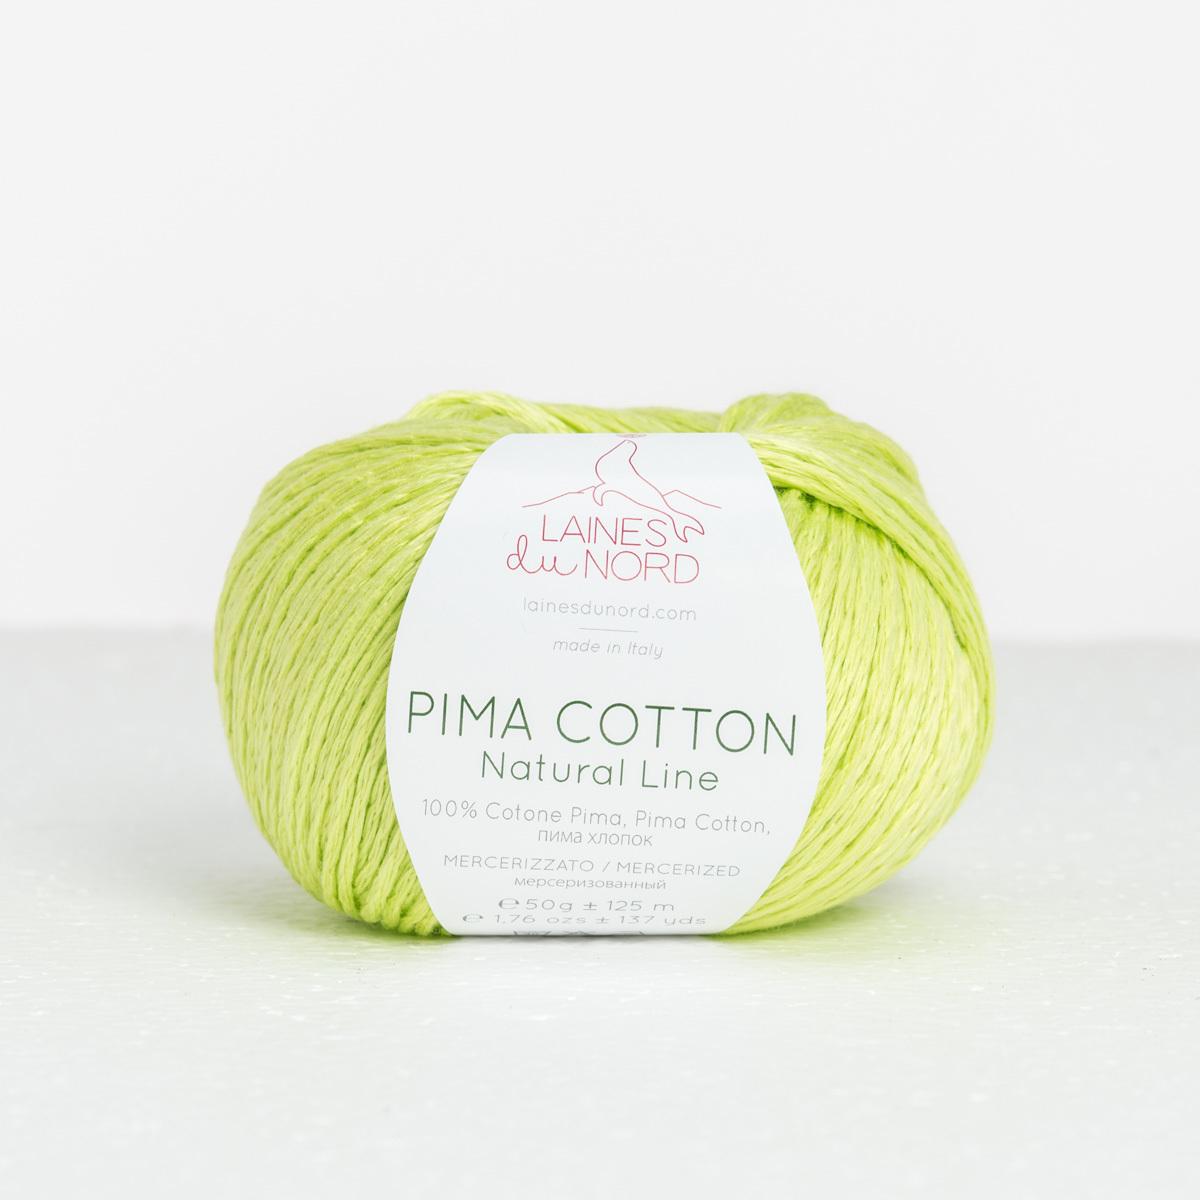 Распродажа! Pima Cotton (100% пима хлопок,50г/125м) 9 BYN